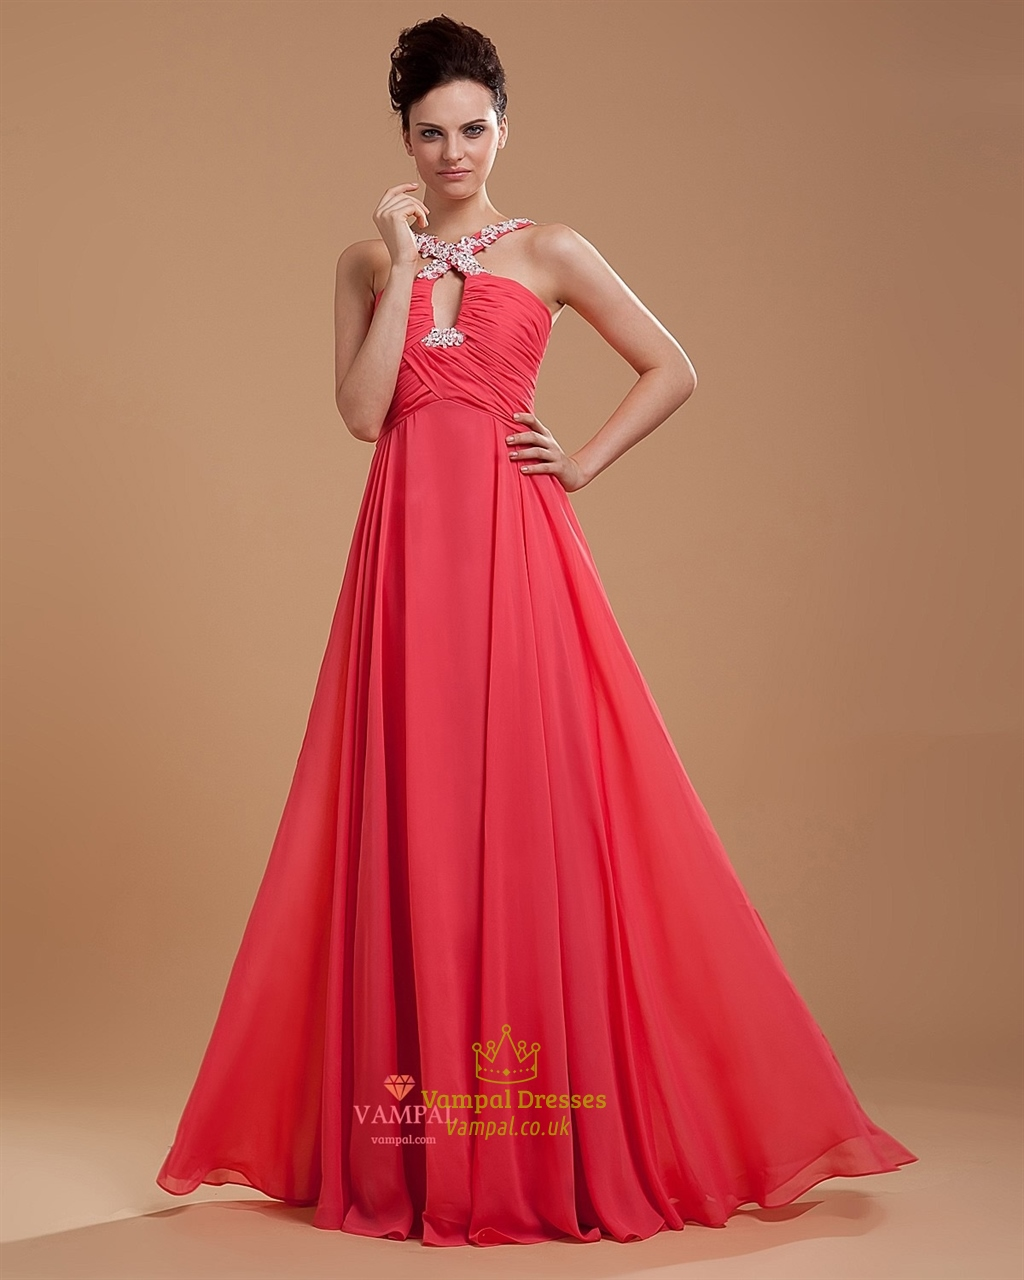 Fullsize Of Pink Prom Dress